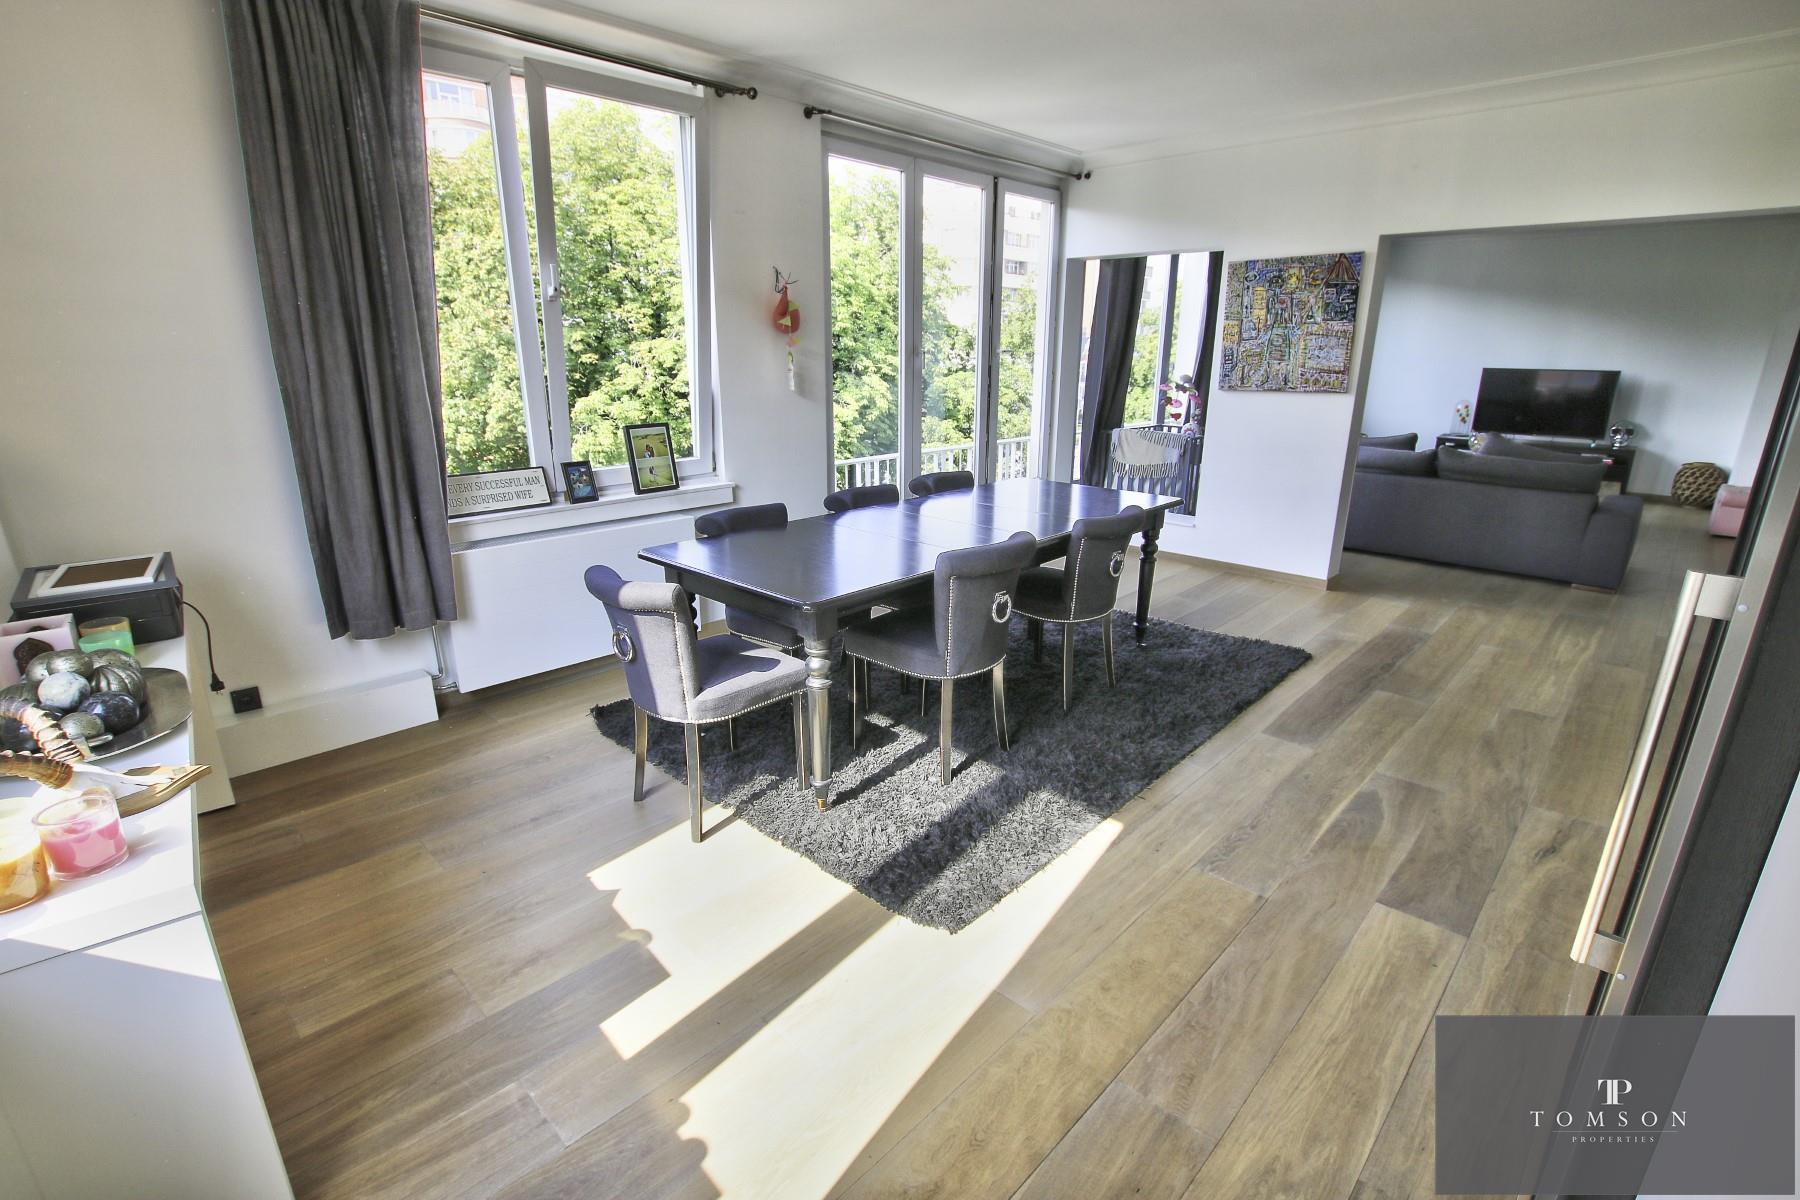 Flat - Etterbeek - #4134994-3